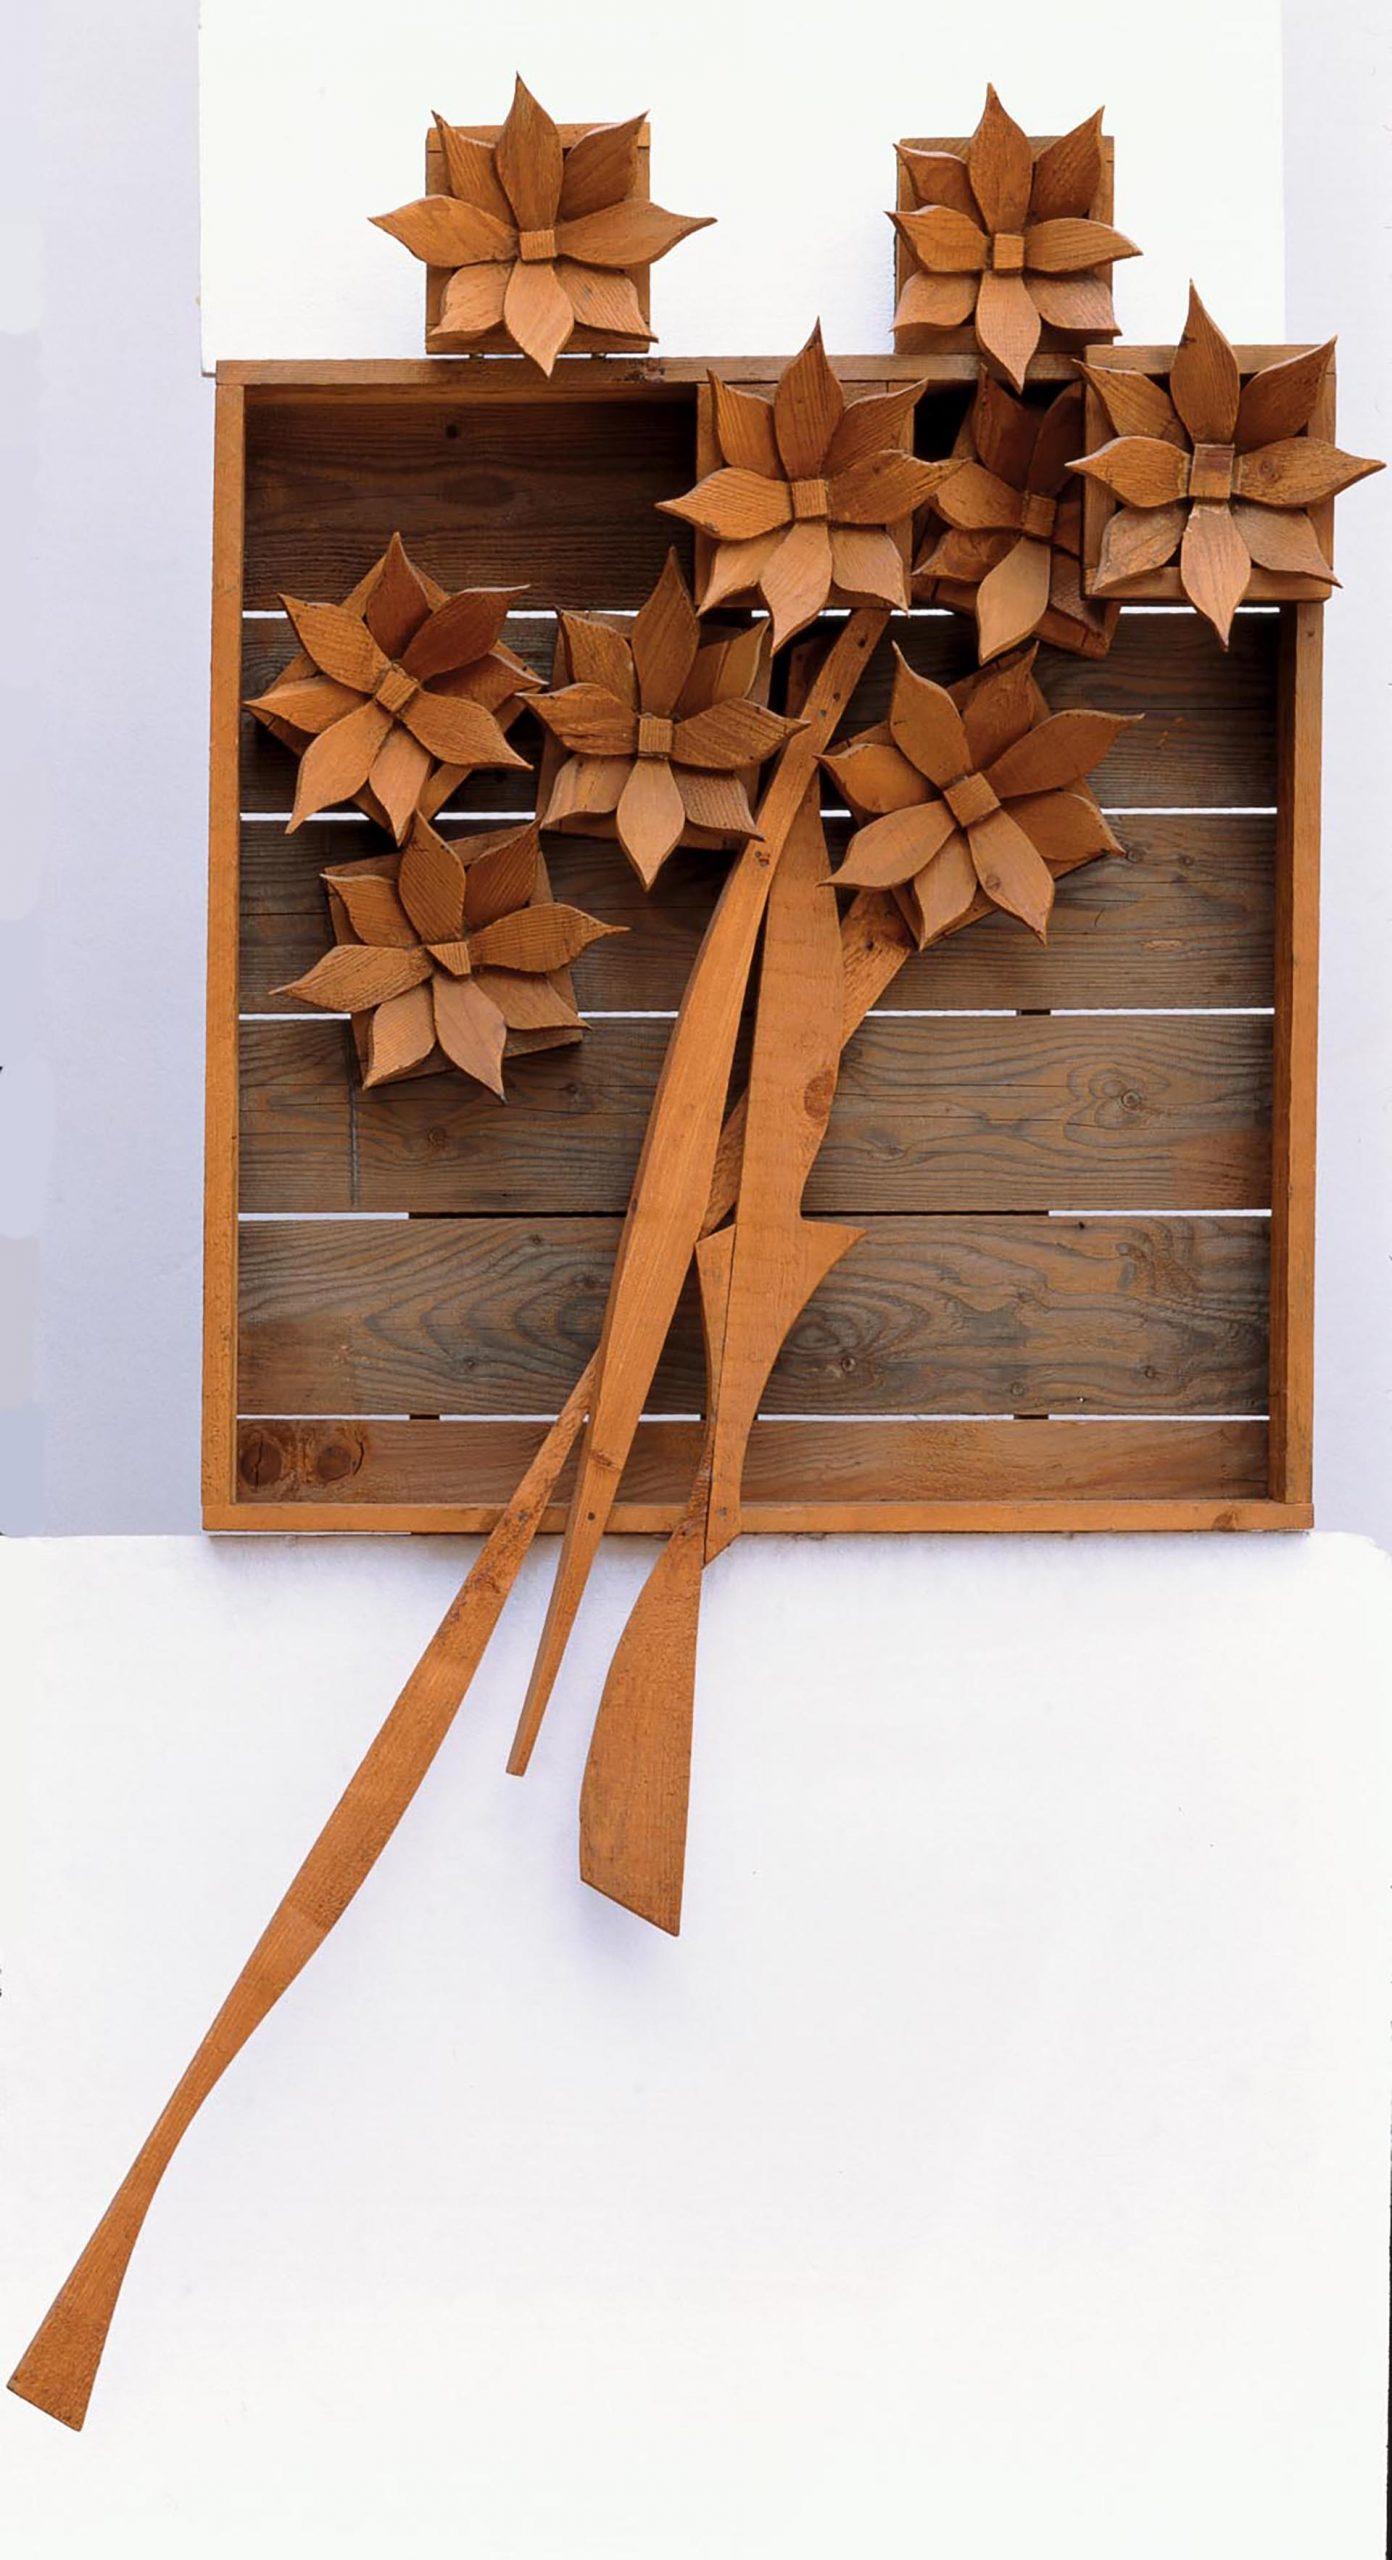 Ceroli, Fiori, 1965, 205x120x30 cm